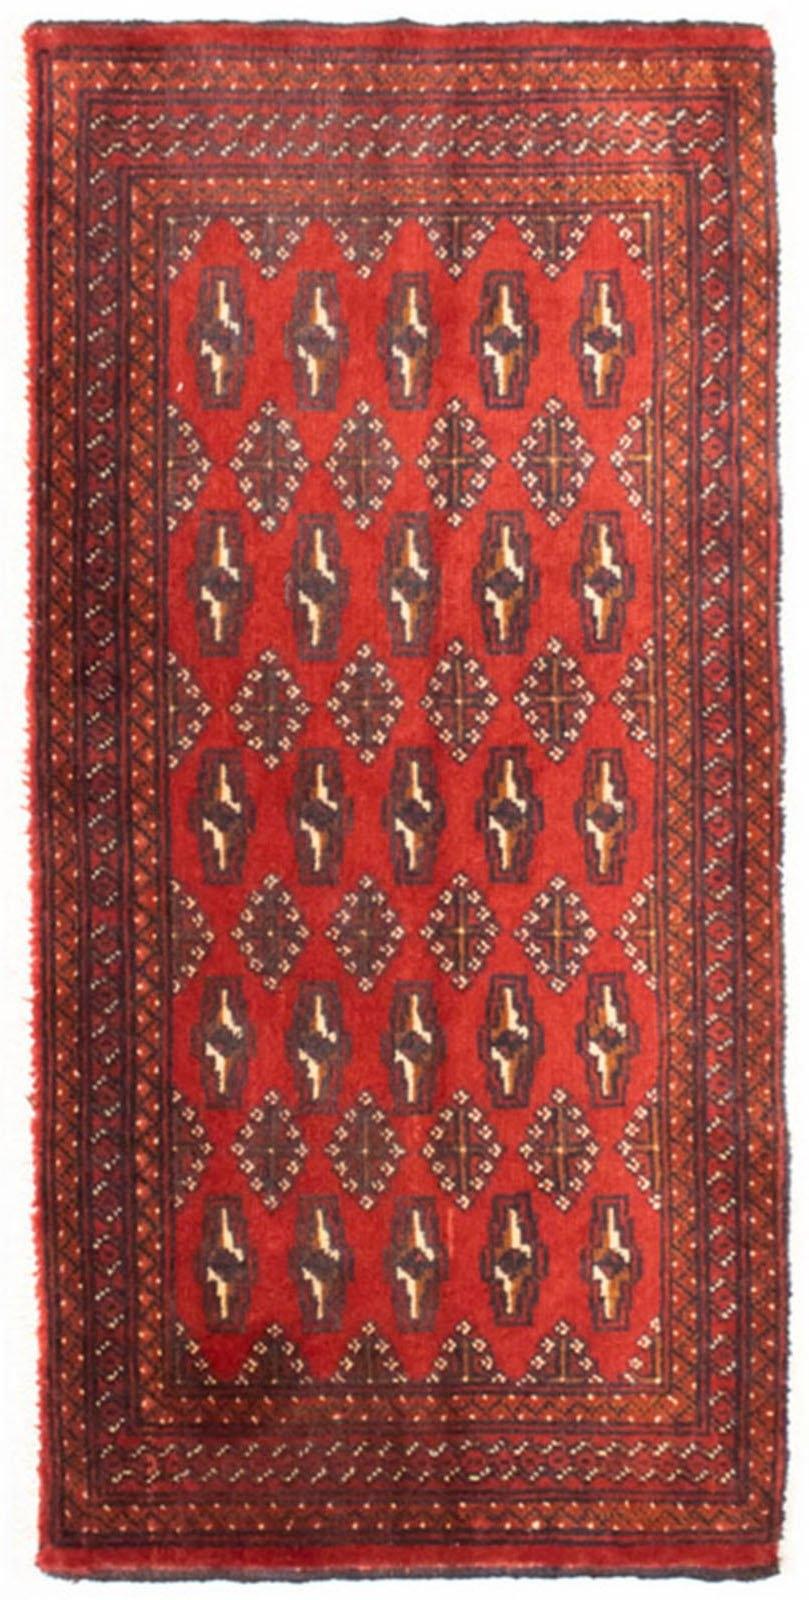 morgenland wollen kleed Turkaman Teppich handgeknüpft rot veilig op otto.nl kopen